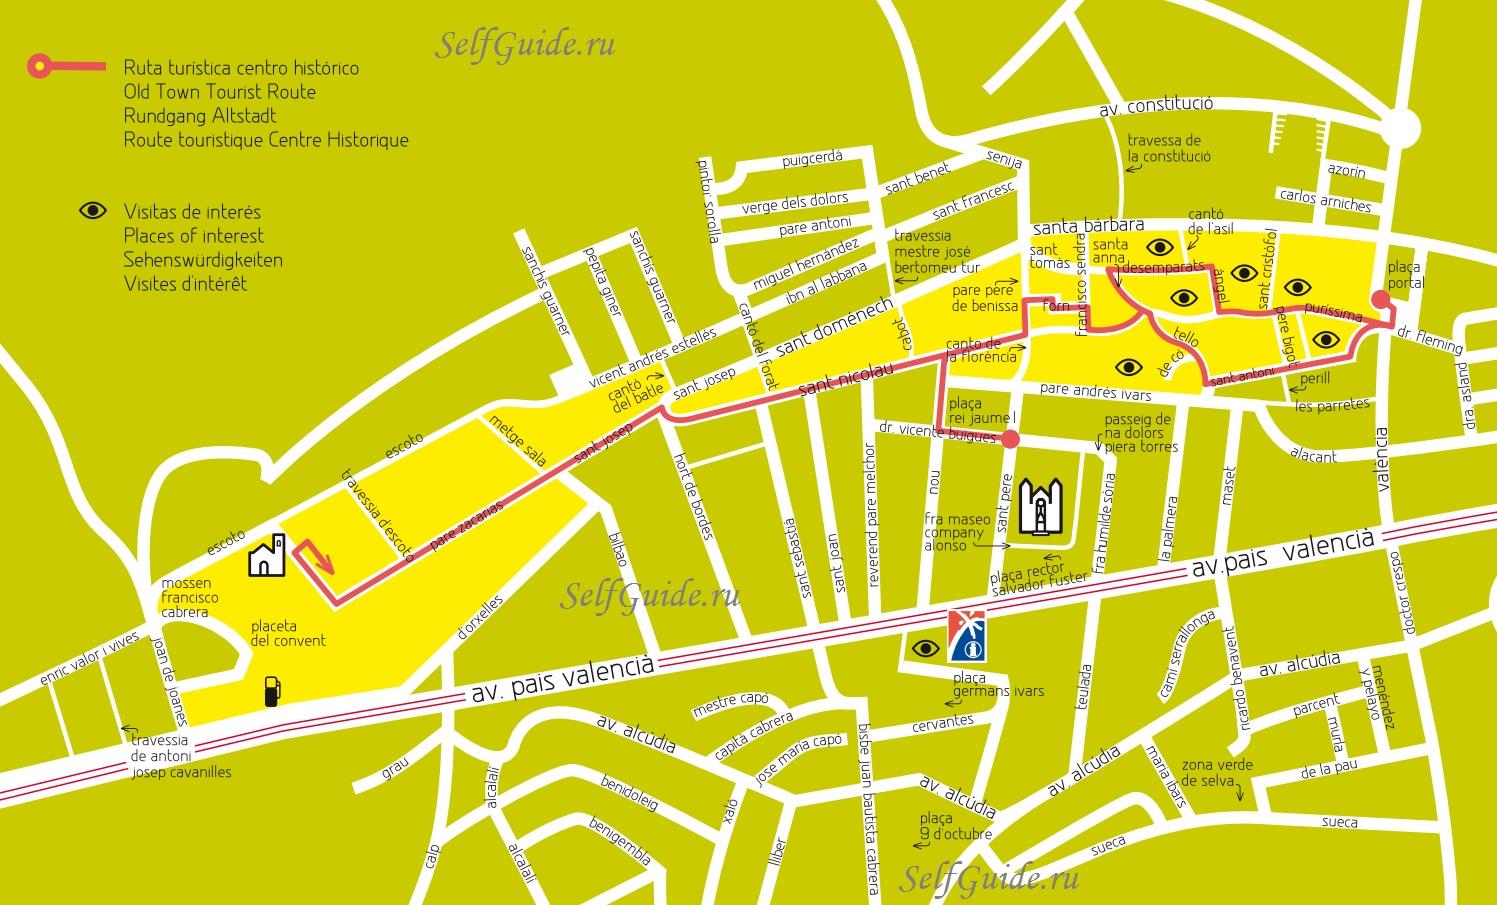 Карта и туристический маршрут по Бениссе